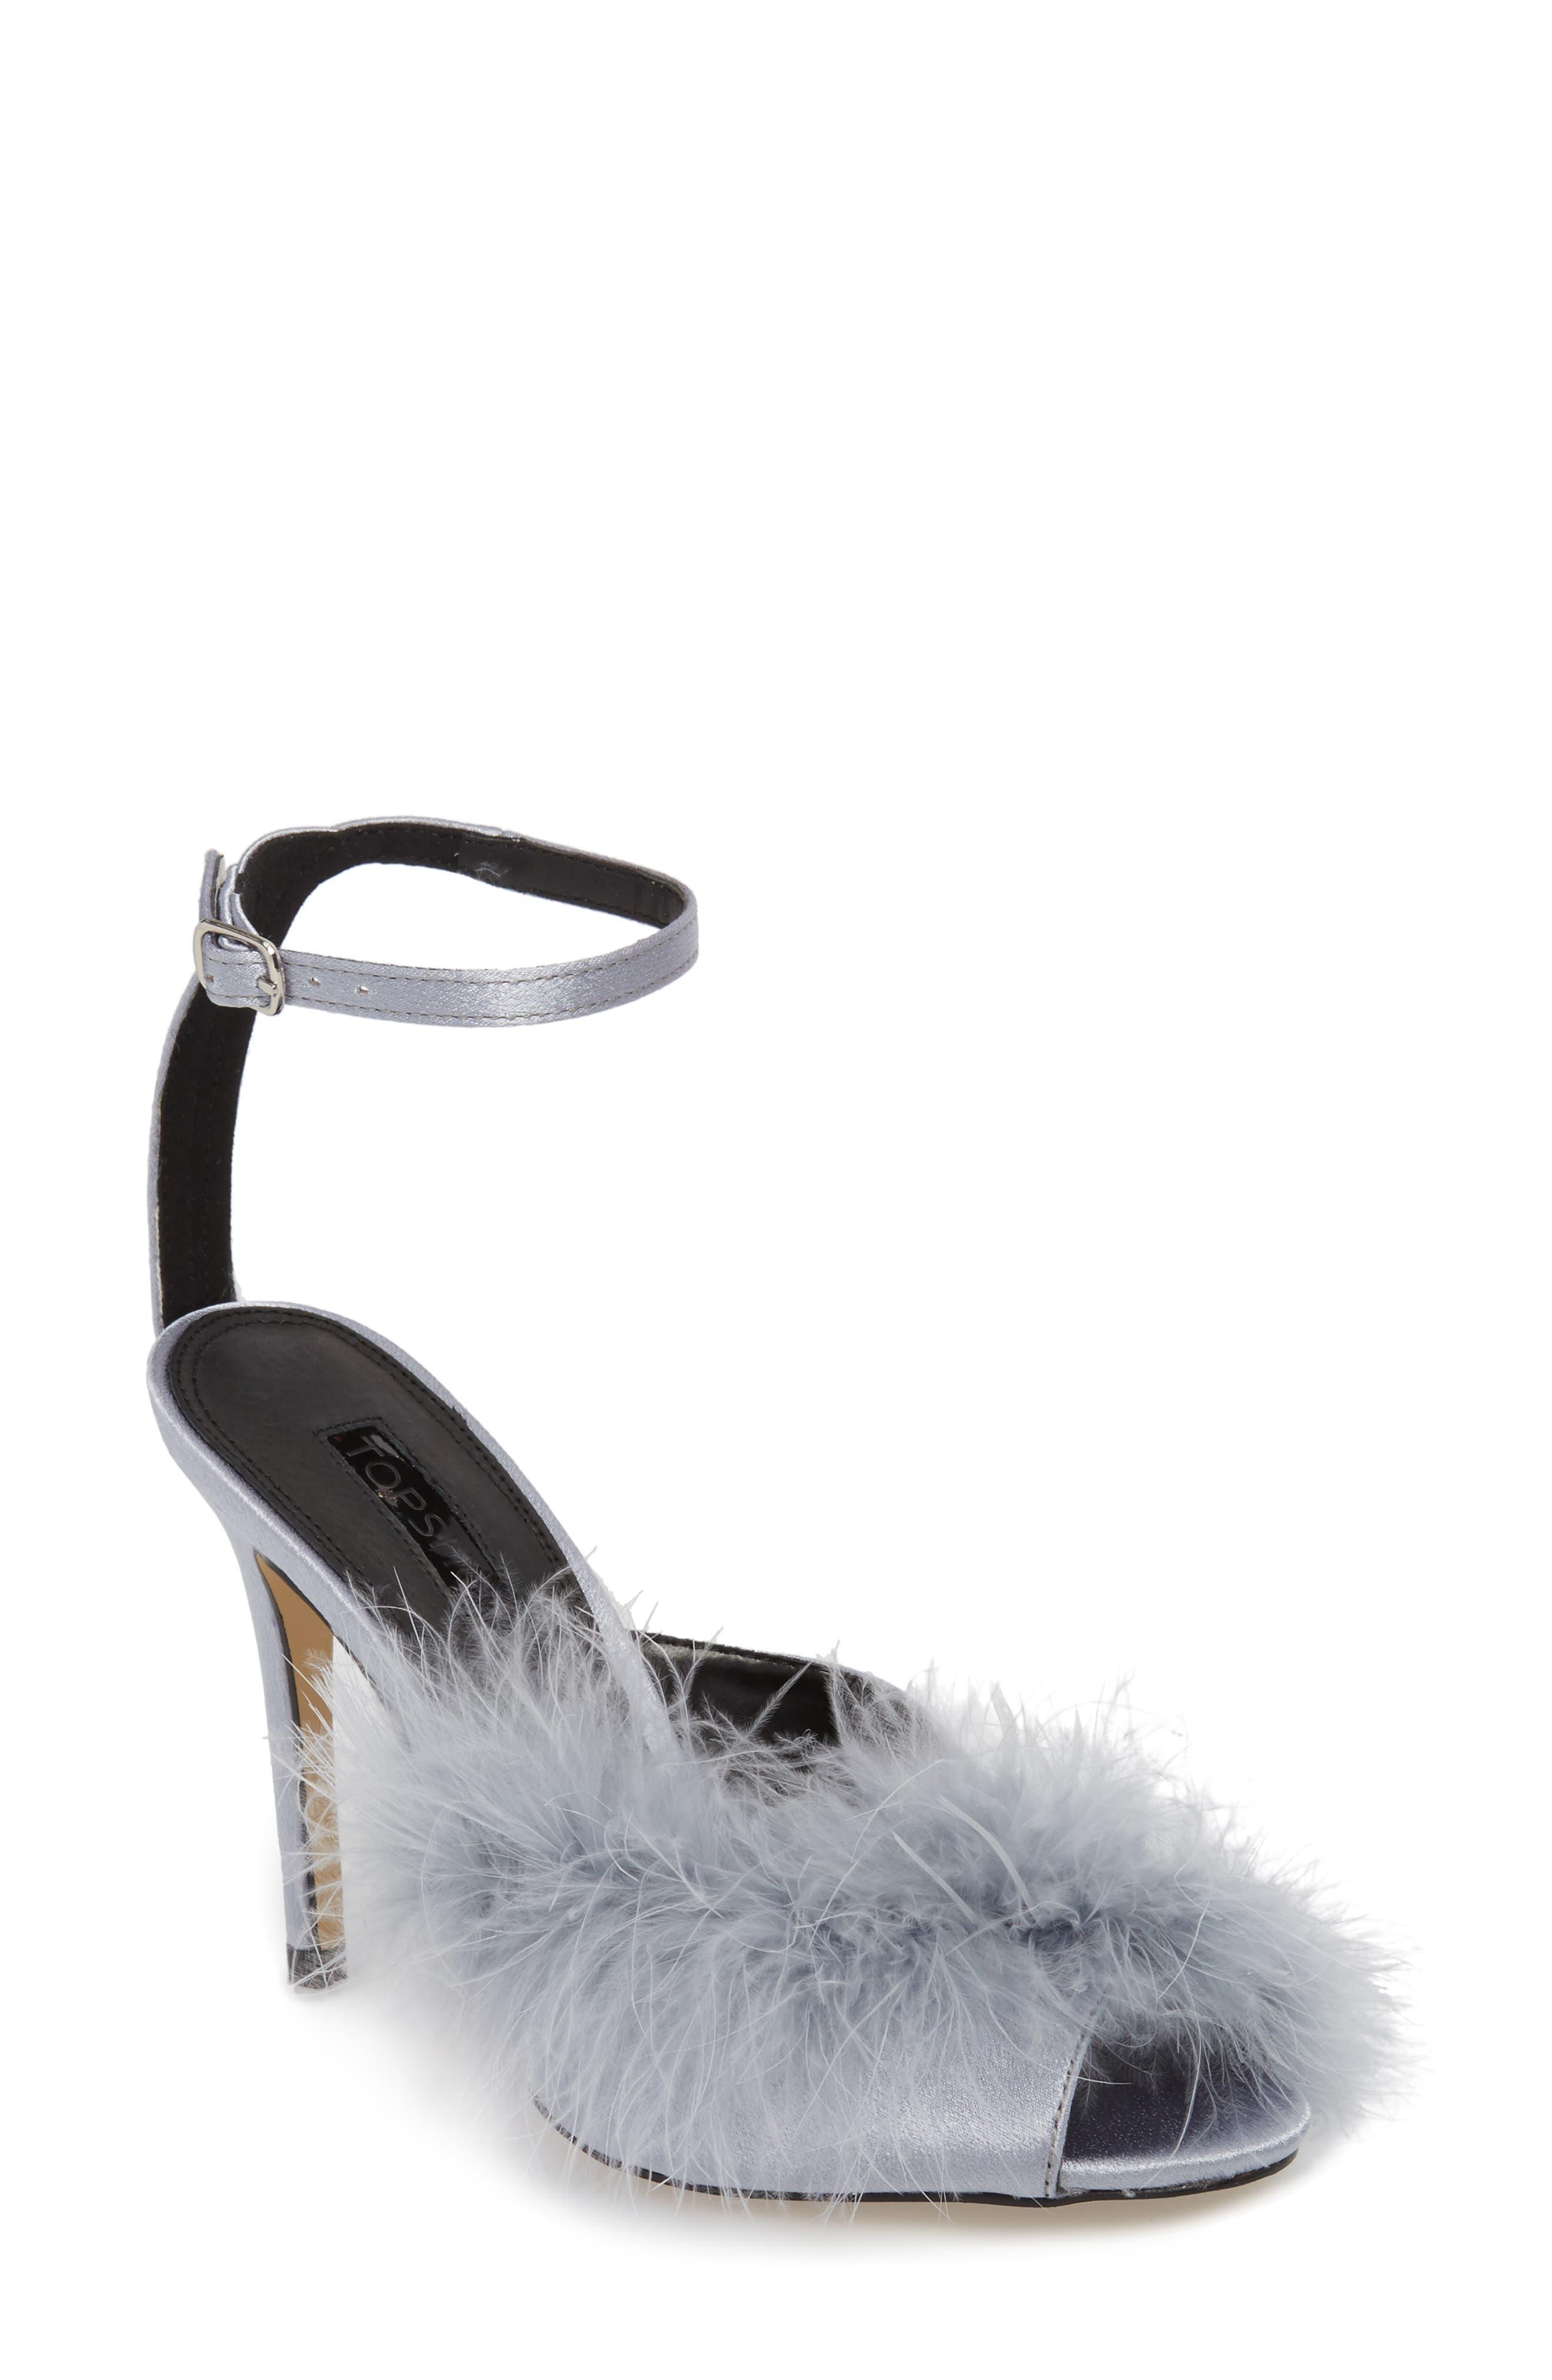 Roar Feather Sandal,                         Main,                         color, GREY